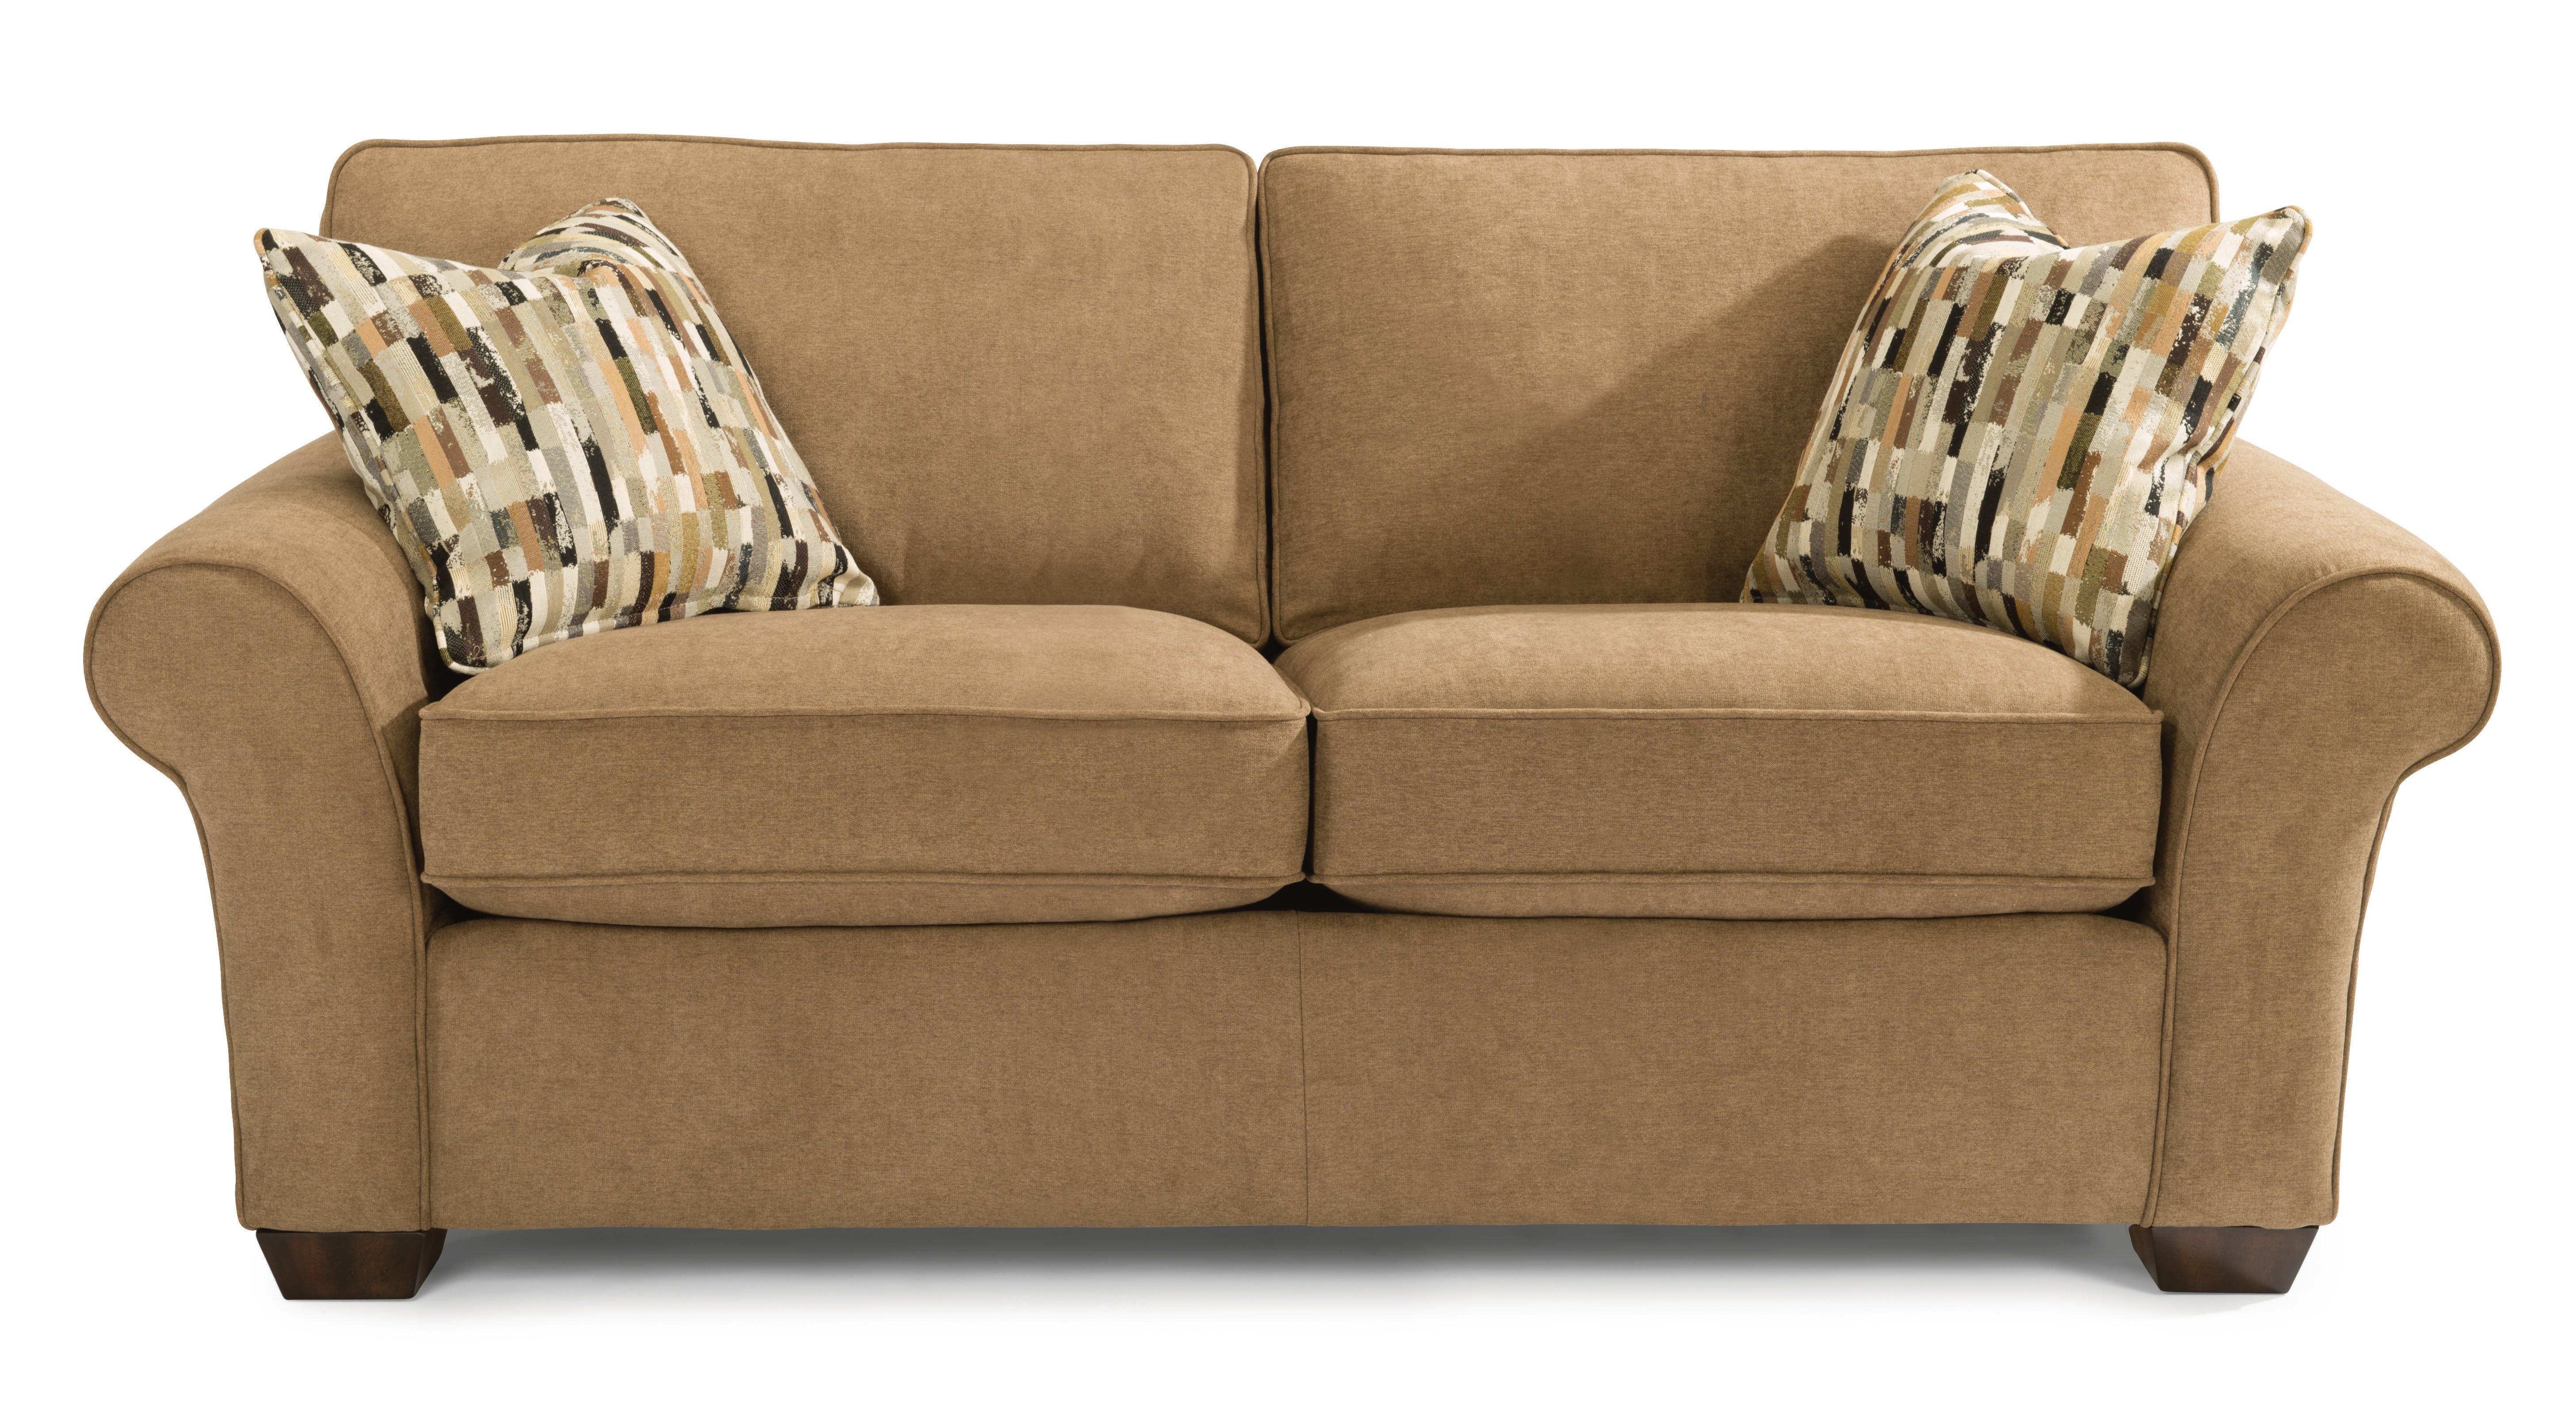 Flexsteel Living Room Fabric Loveseat 7305-20 - Furniture Plus Inc